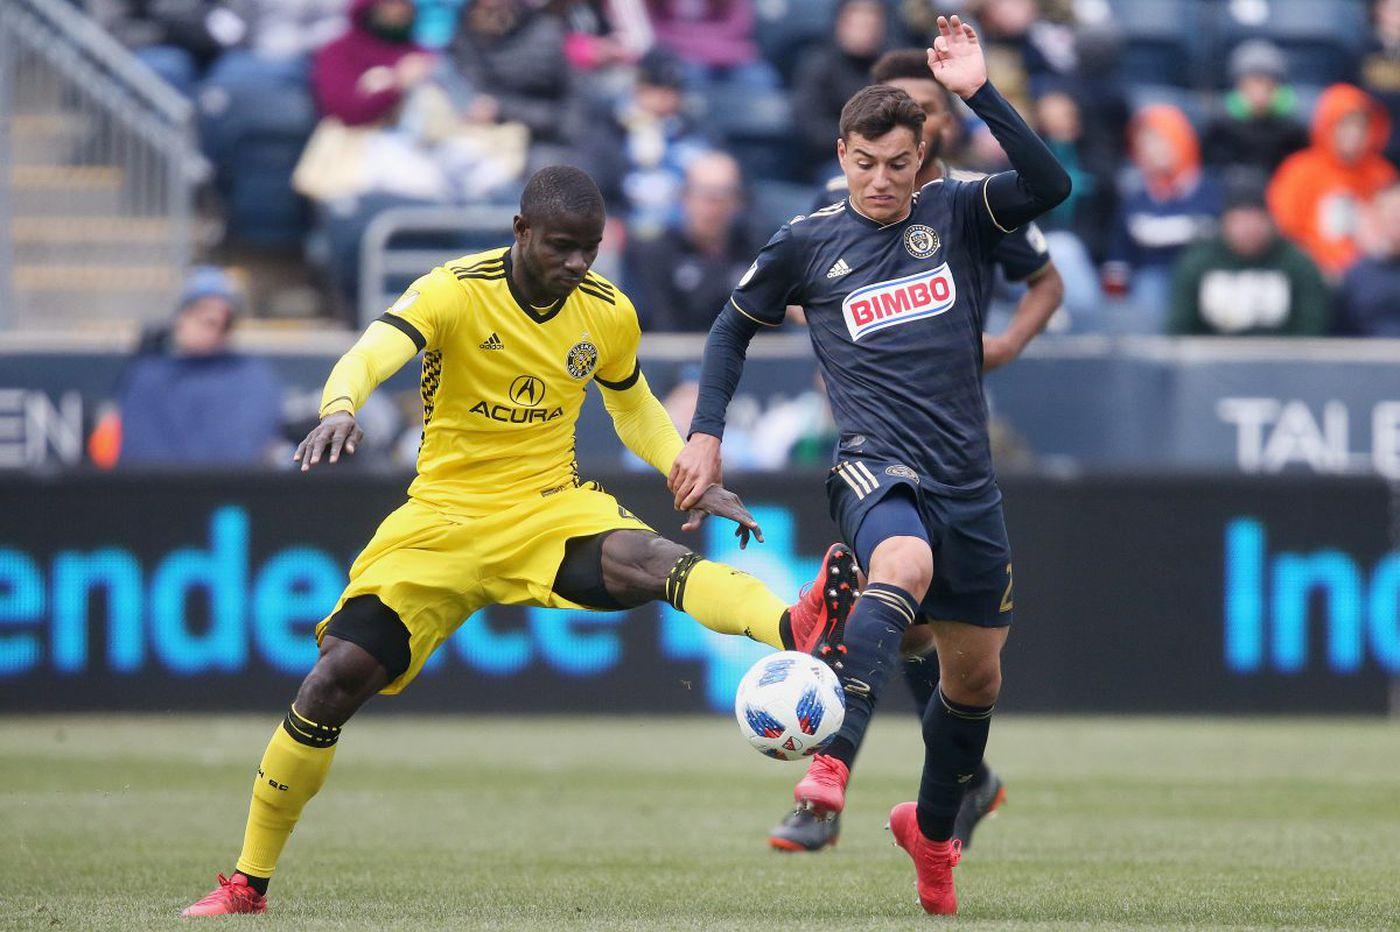 As the Union's offense struggles, Anthony Fontana waits to provide a spark